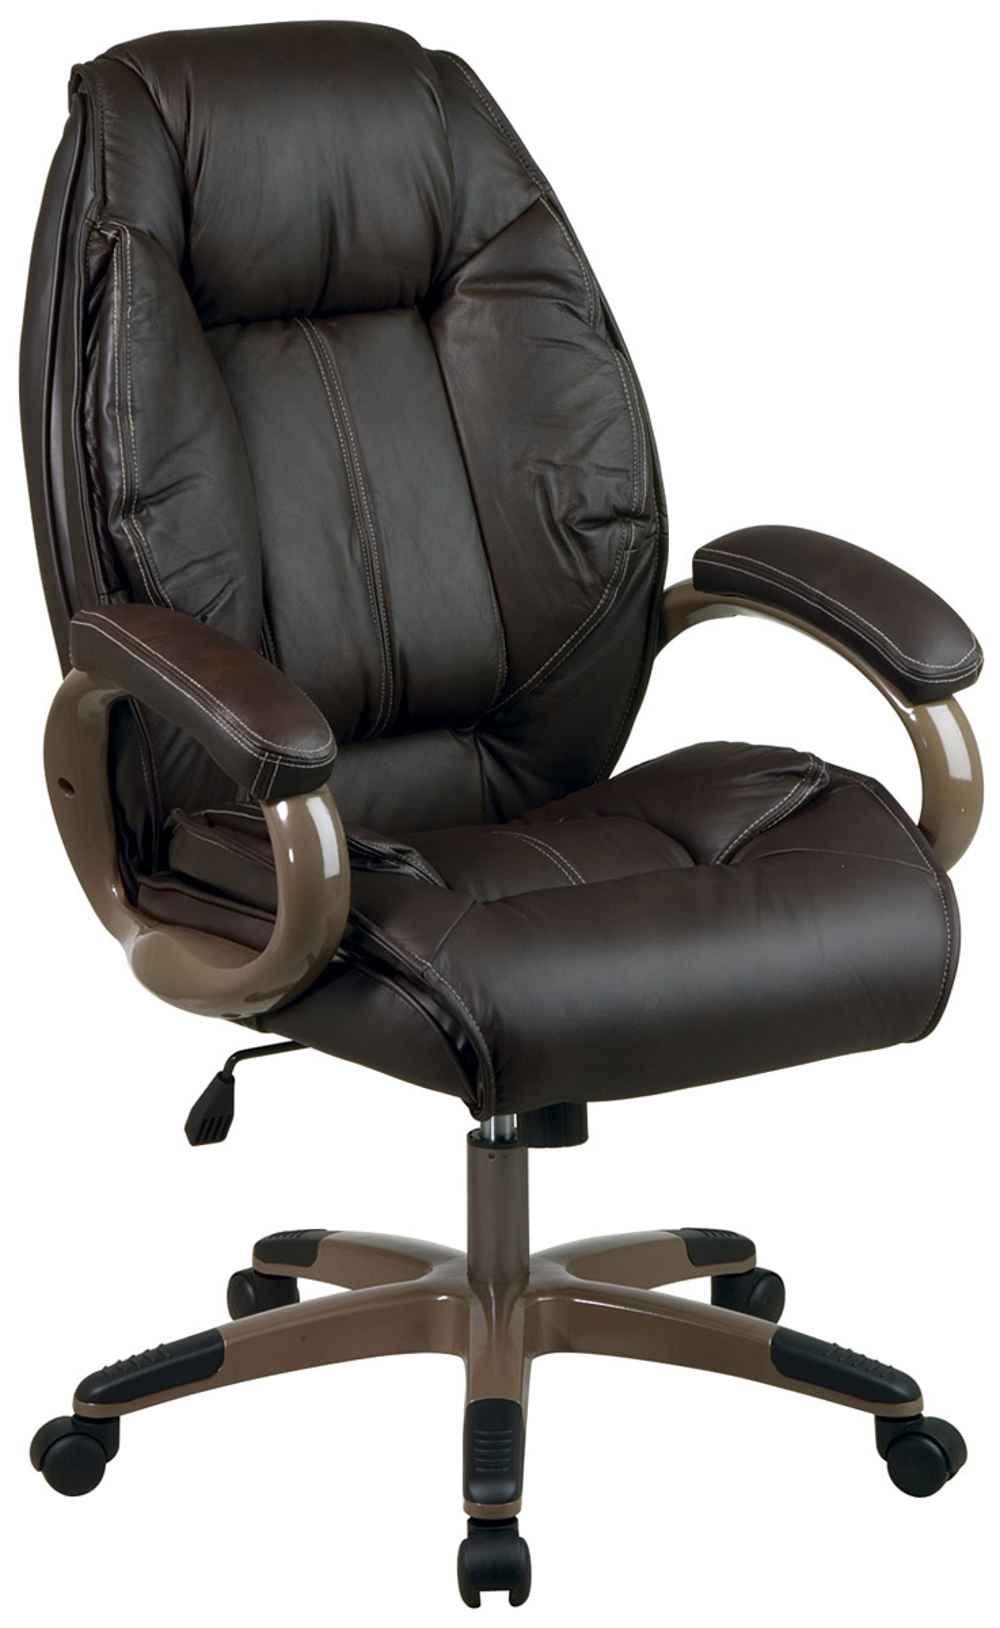 Sealy Office Chair | bangkokfoodietour.com